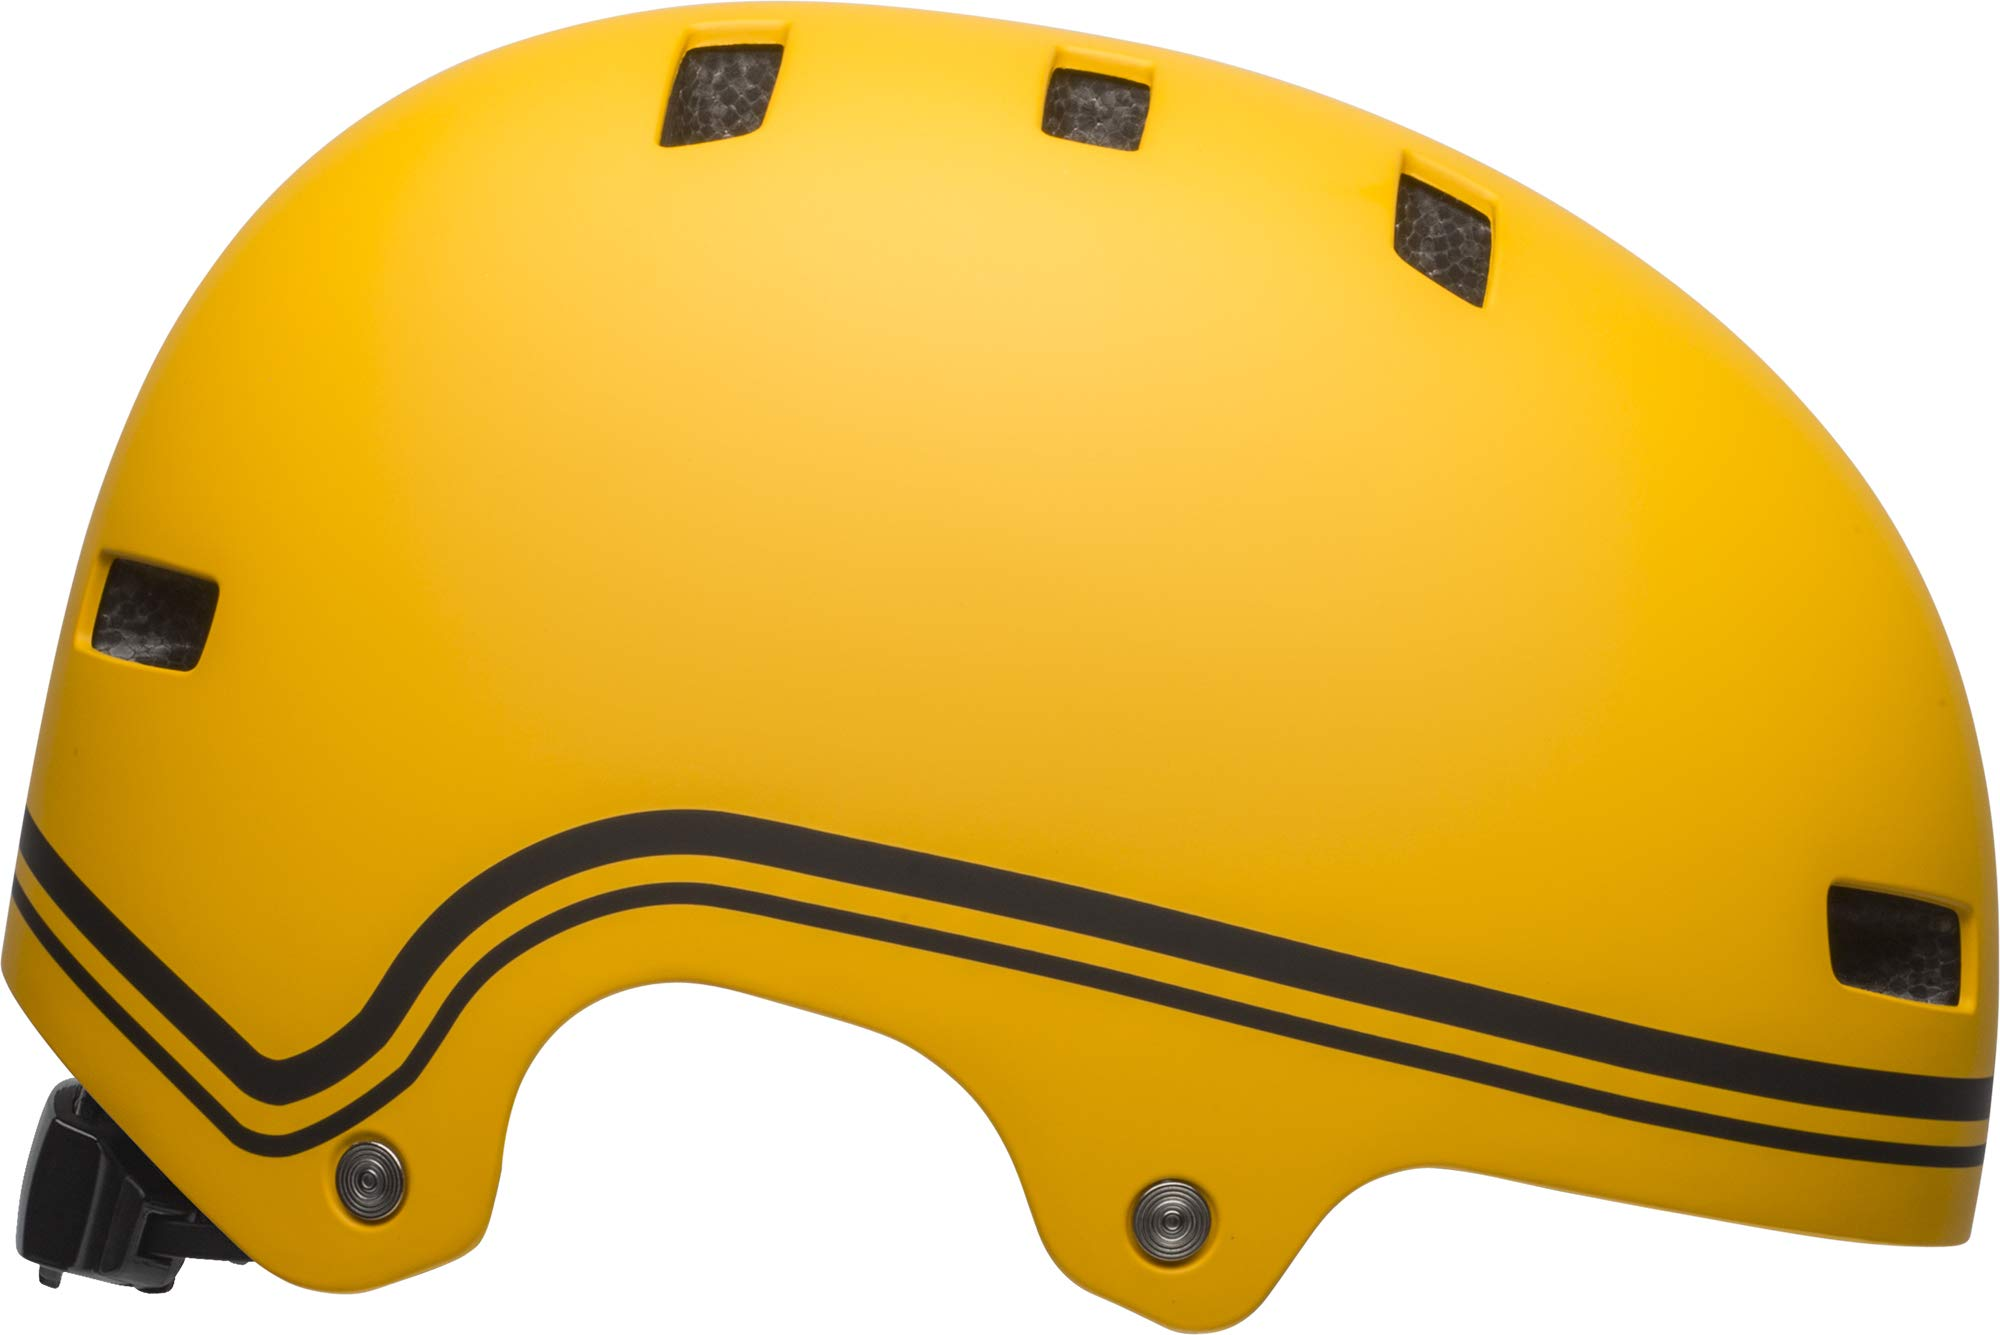 Bell Local Adult BMX & Skate Helmet (Classic Matte Yellow/Black (2019), Small)